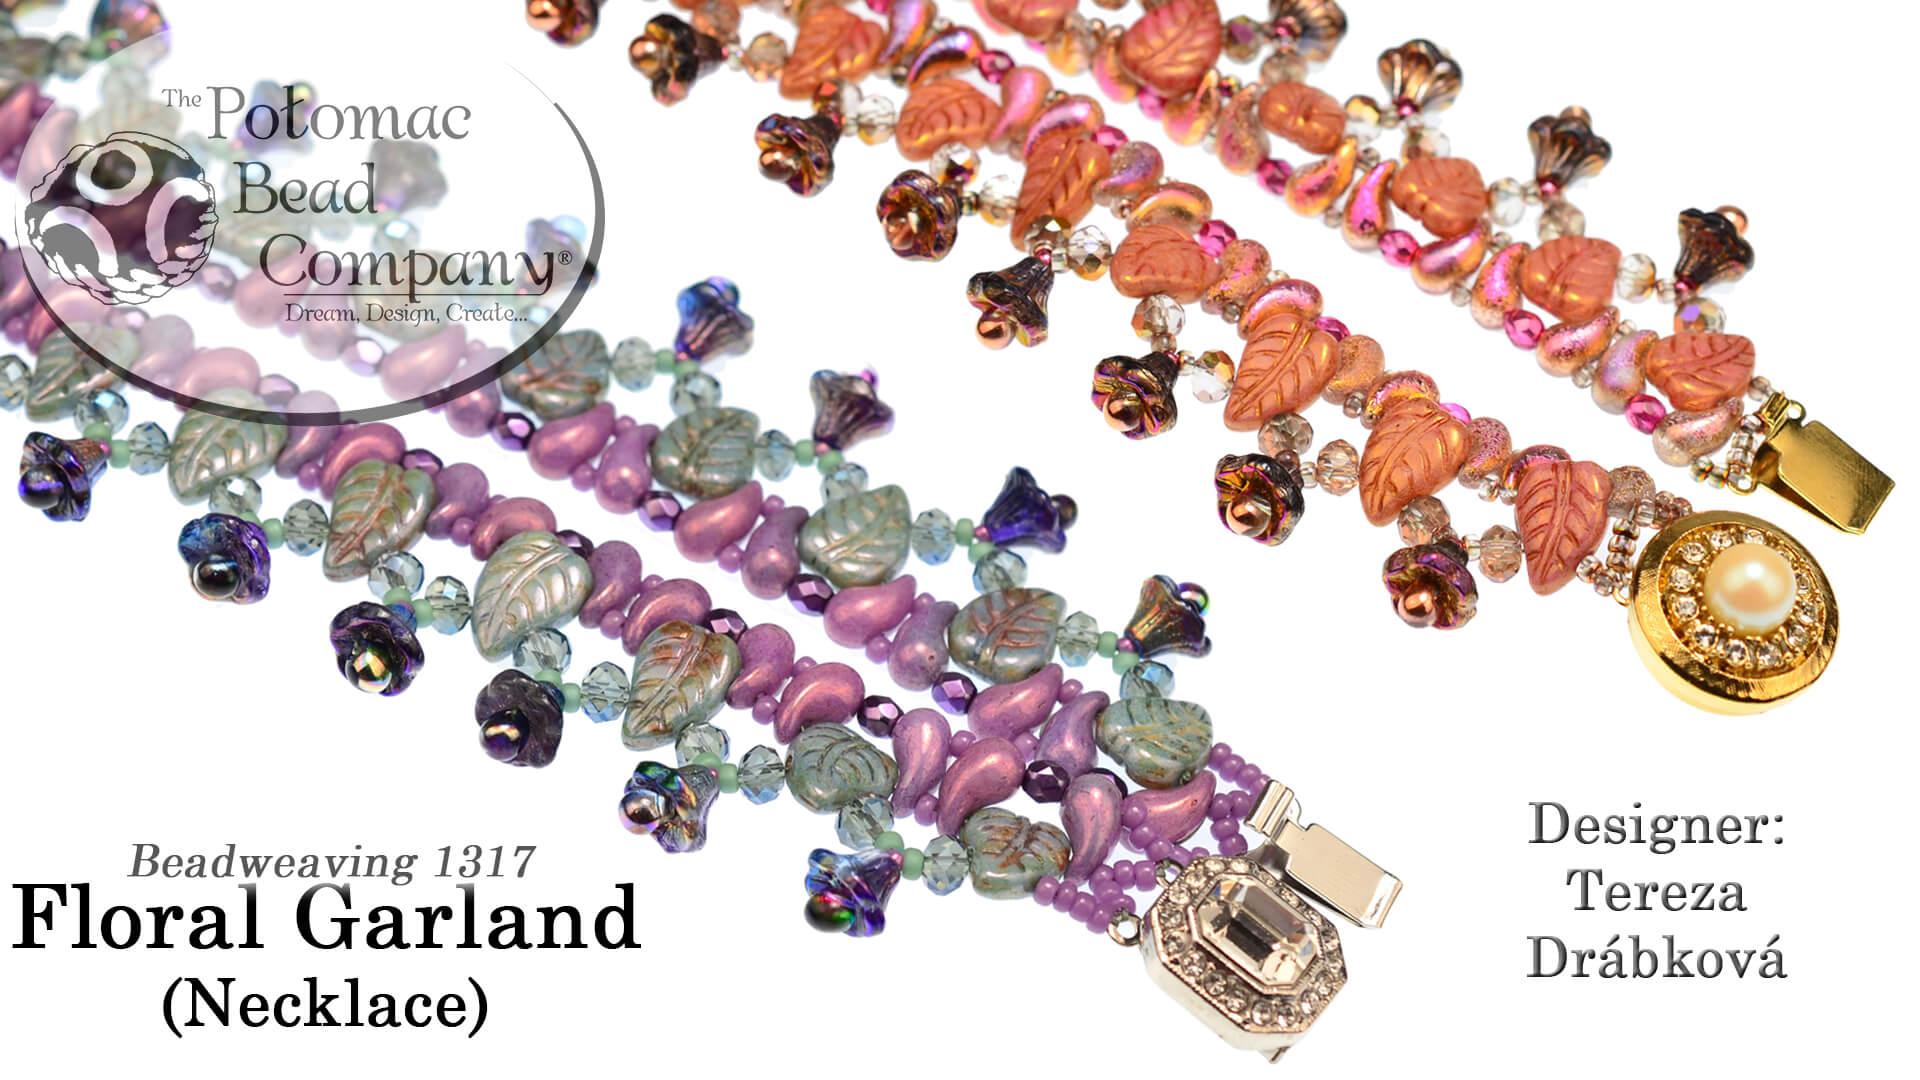 How to Bead Jewelry / Beading Tutorials & Jewel Making Videos / Bead Weaving Tutorials & Necklace Tutorial / Floral Garland Necklace Tutorial